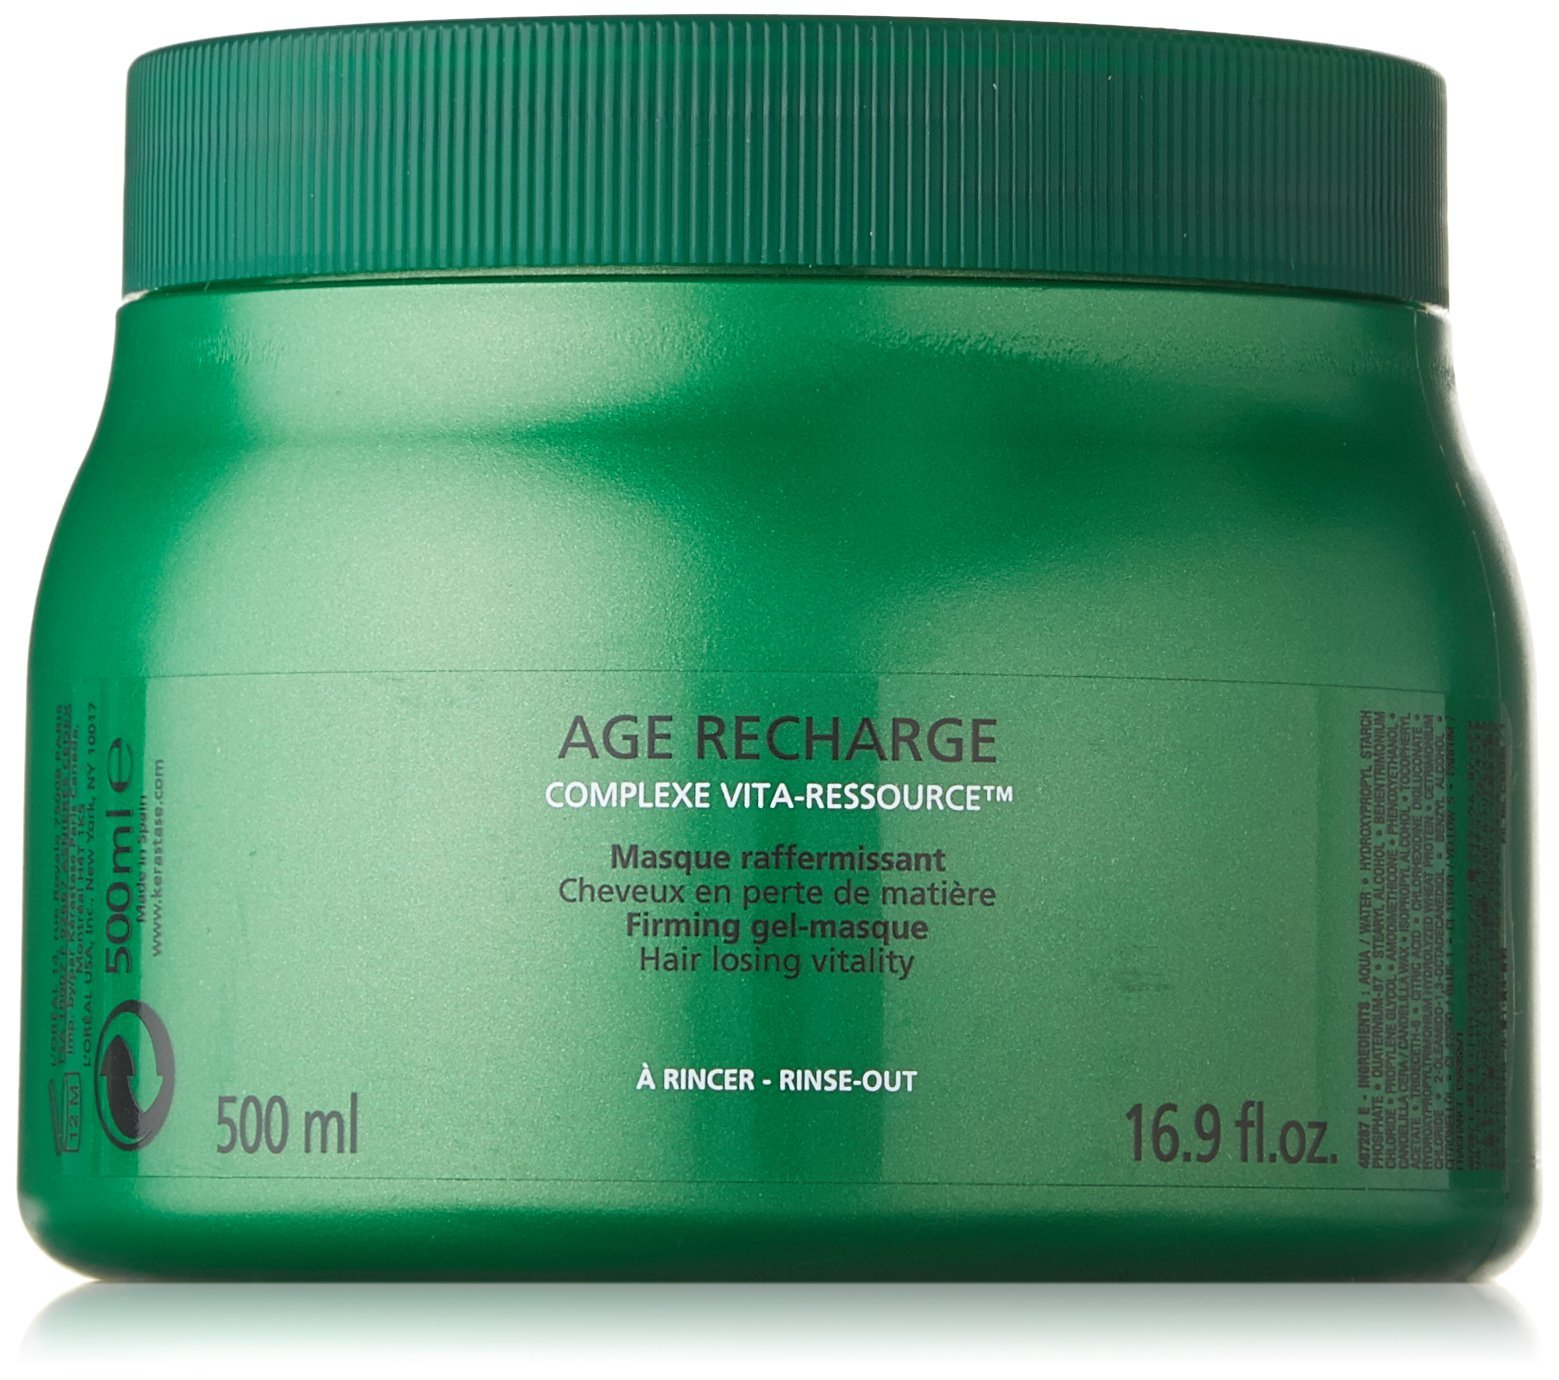 Kerastase Age Recharge Firming Gel Masque, 16.9 Ounce